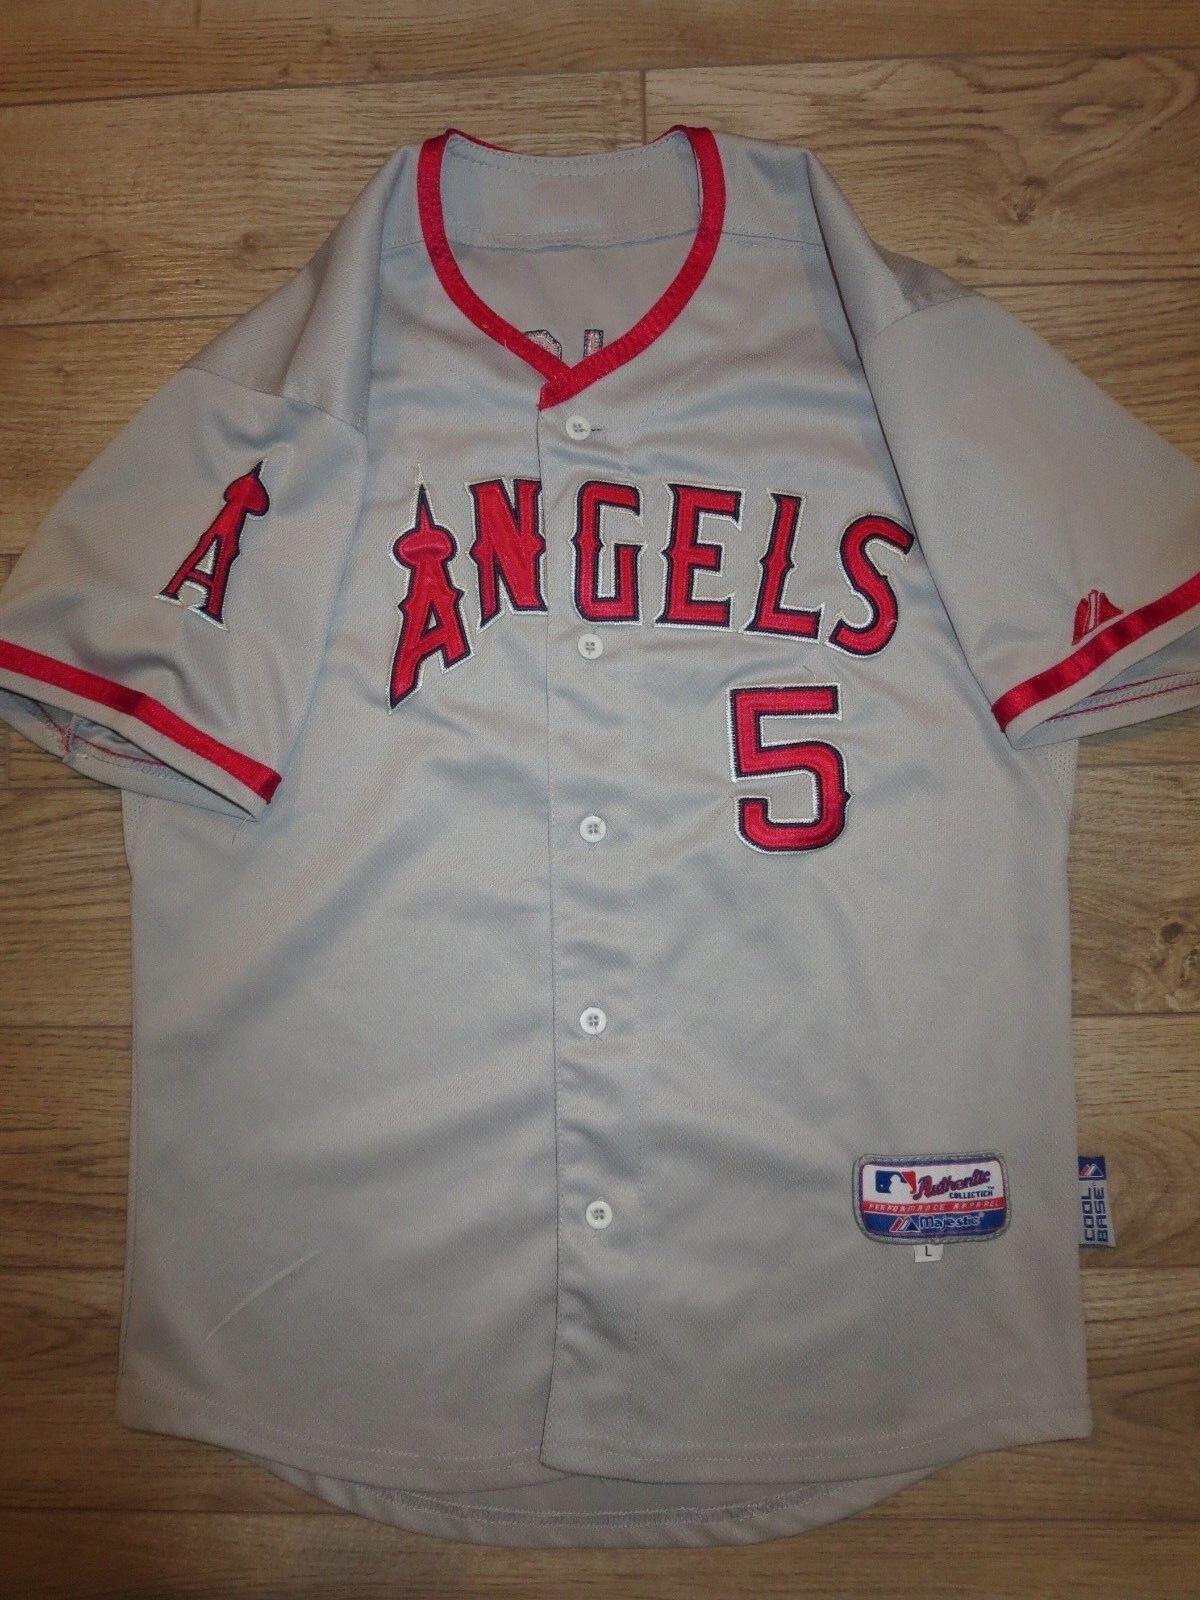 Albert Albert Albert Pujols  5 Of Anaheim Angels Majestätisch MLB Trikot Jugendliche L 14-16 a5ecf2